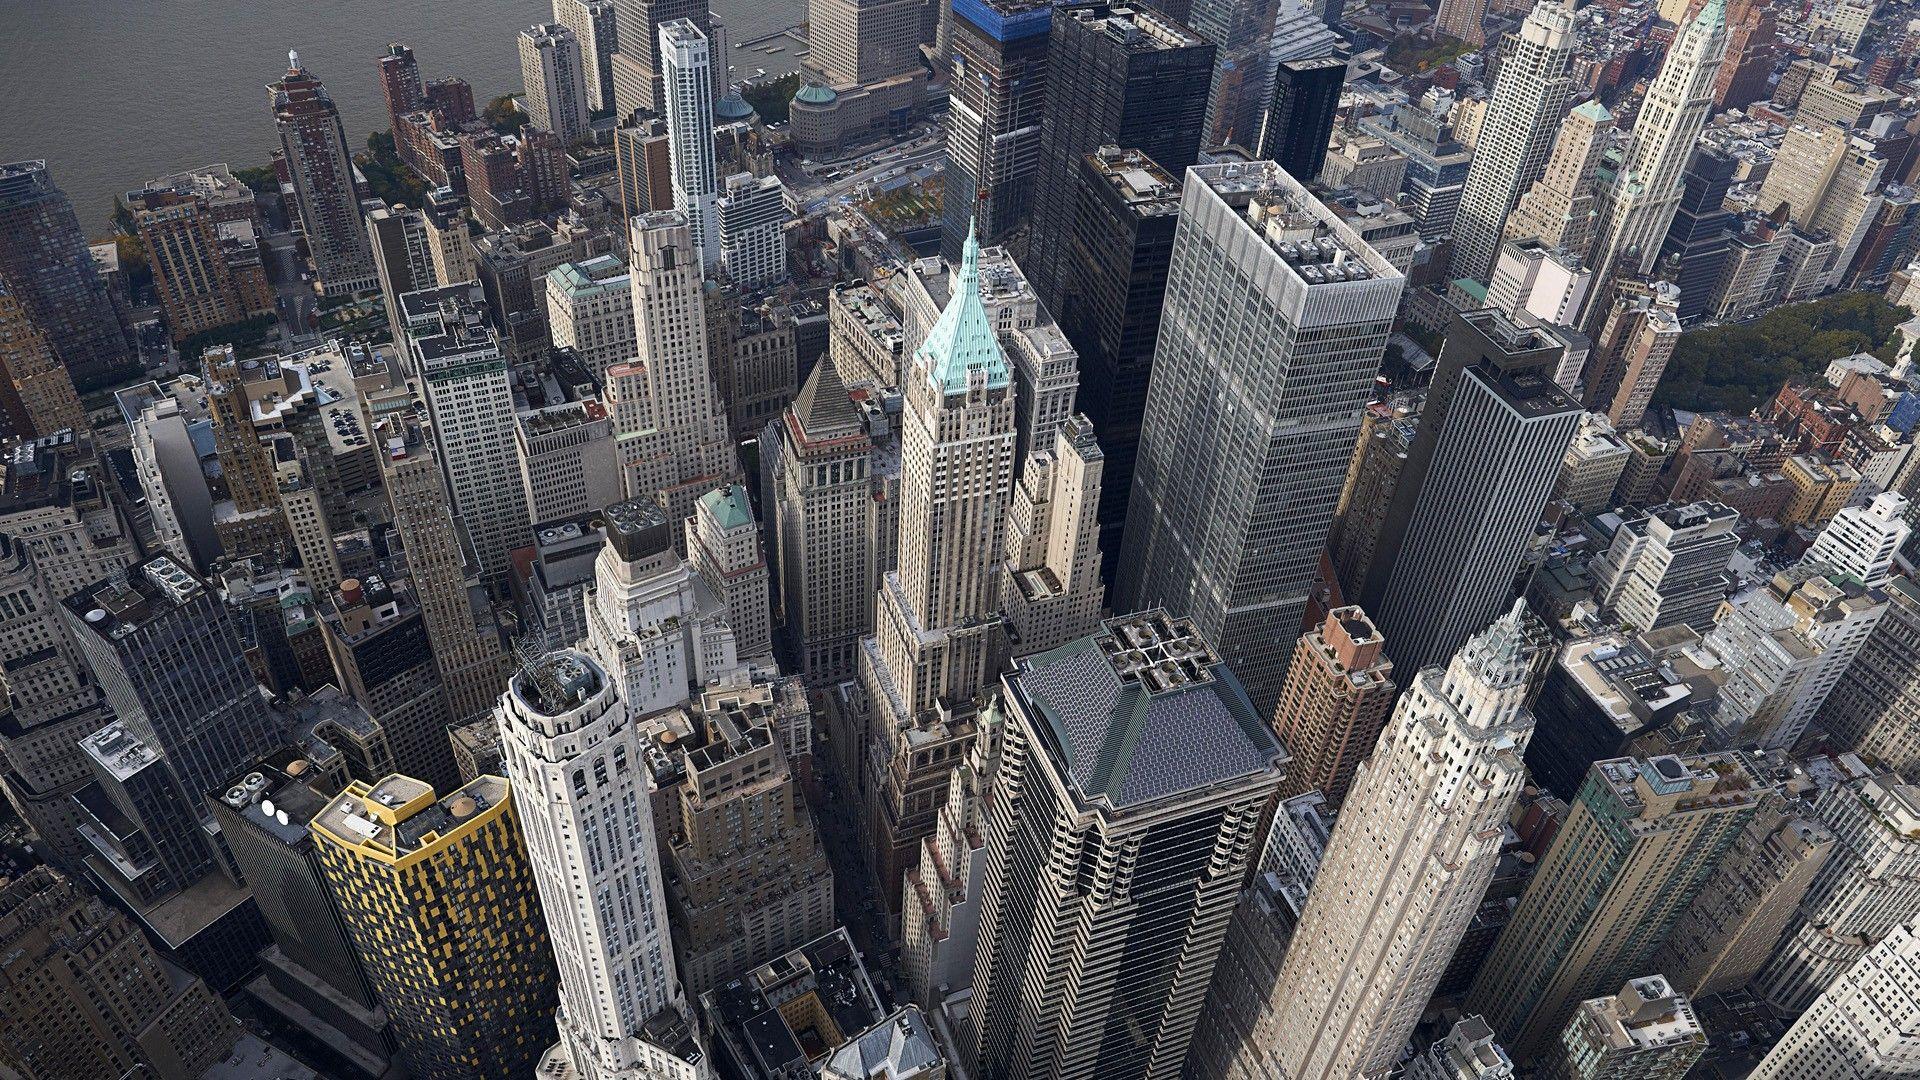 cityscapesnewyorkcityaerialview.jpg (1920×1080) D